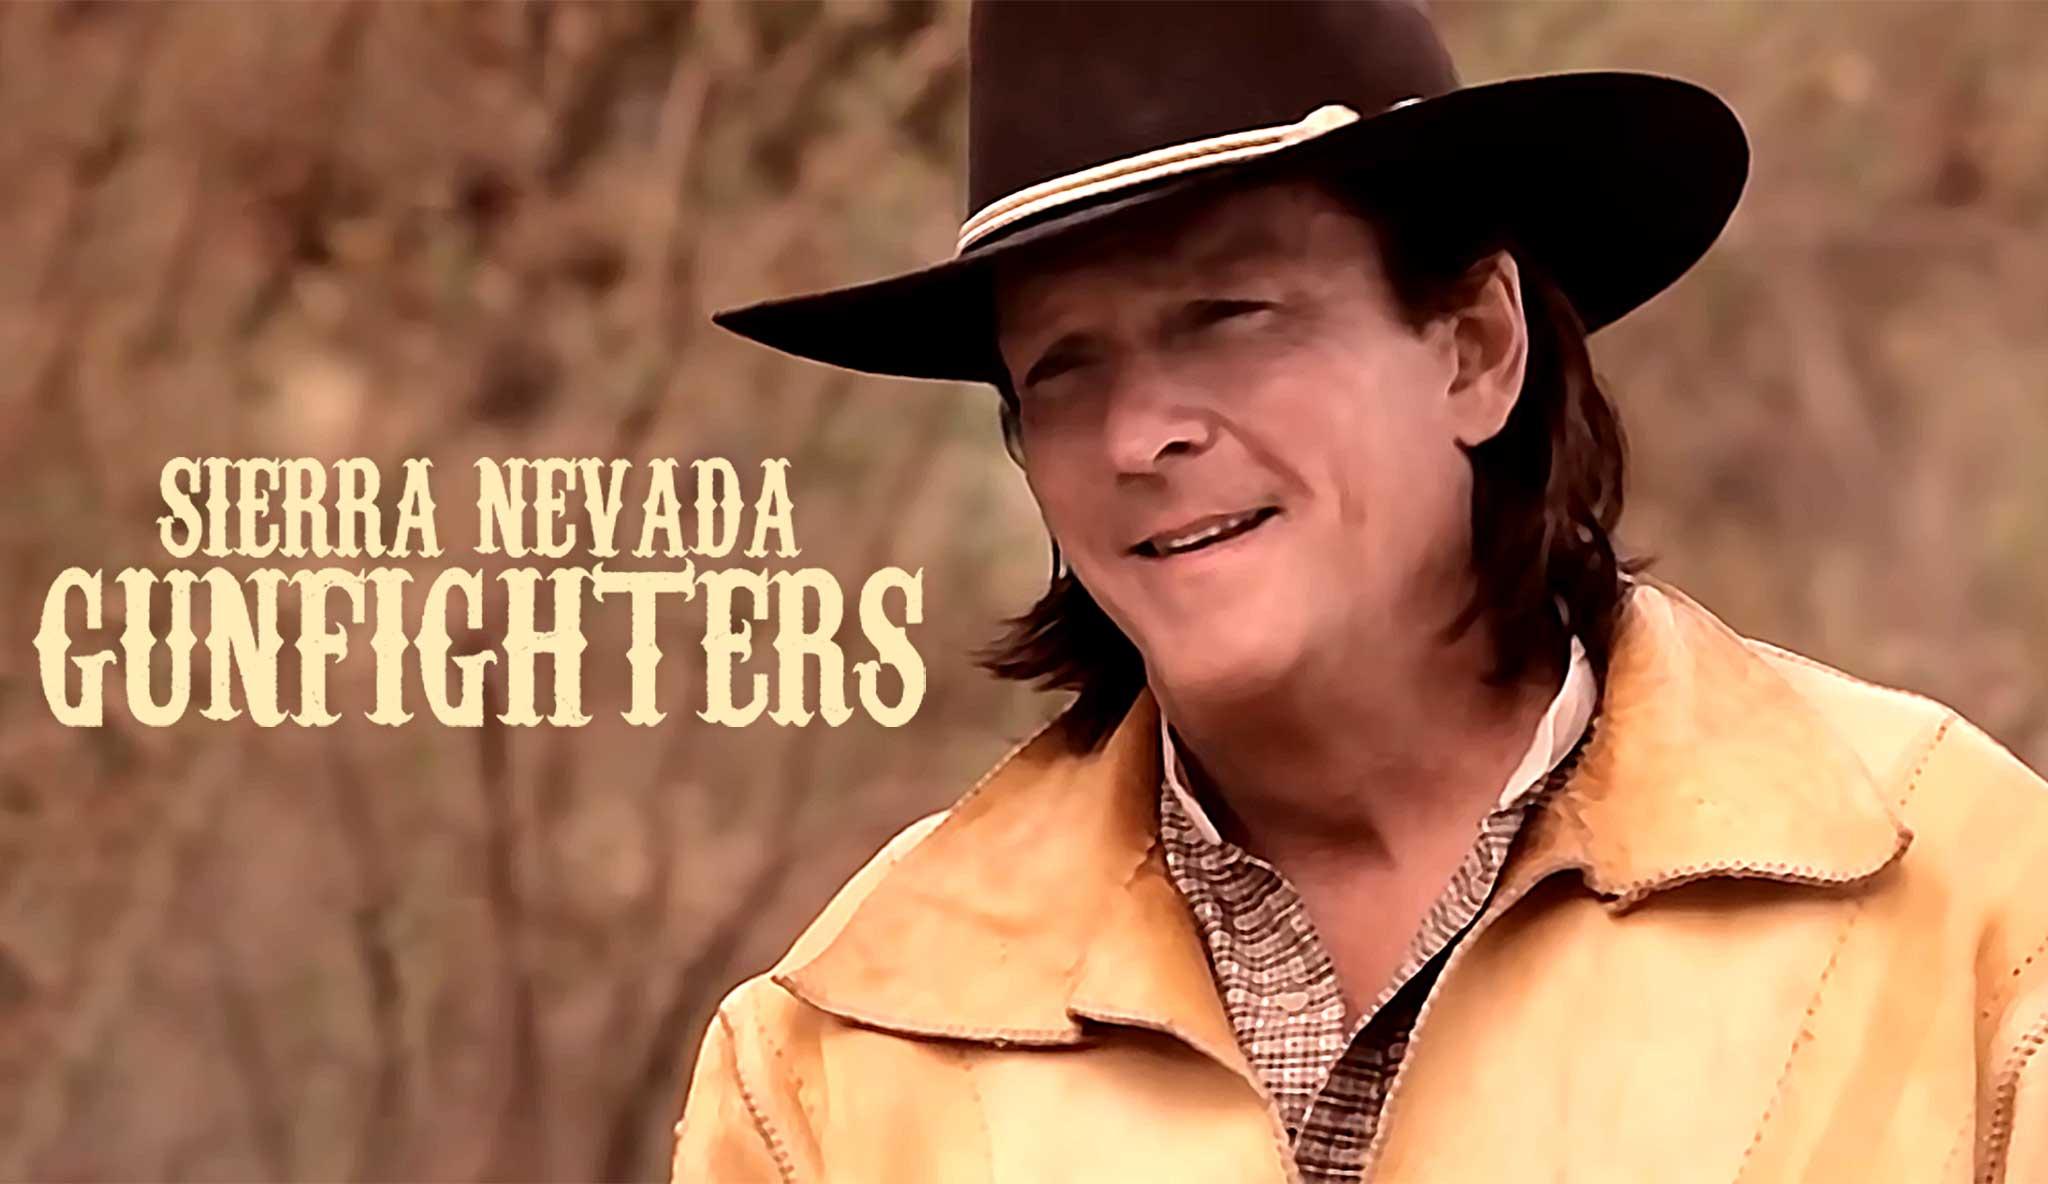 sierra-nevada-gunfighters\header.jpg